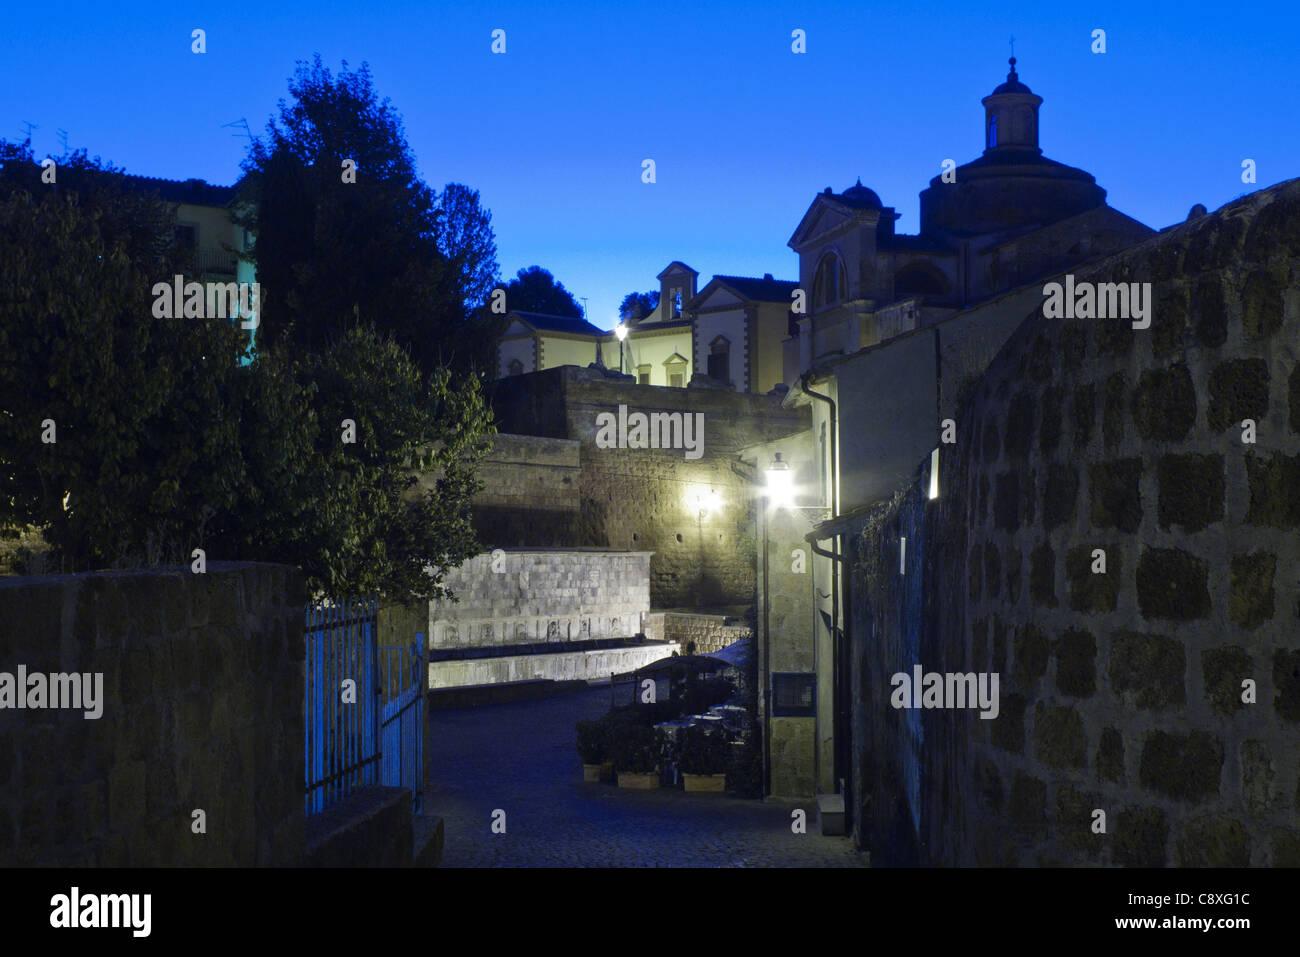 Vista notturna di Tuscania, una piccola città in Italia. Immagini Stock